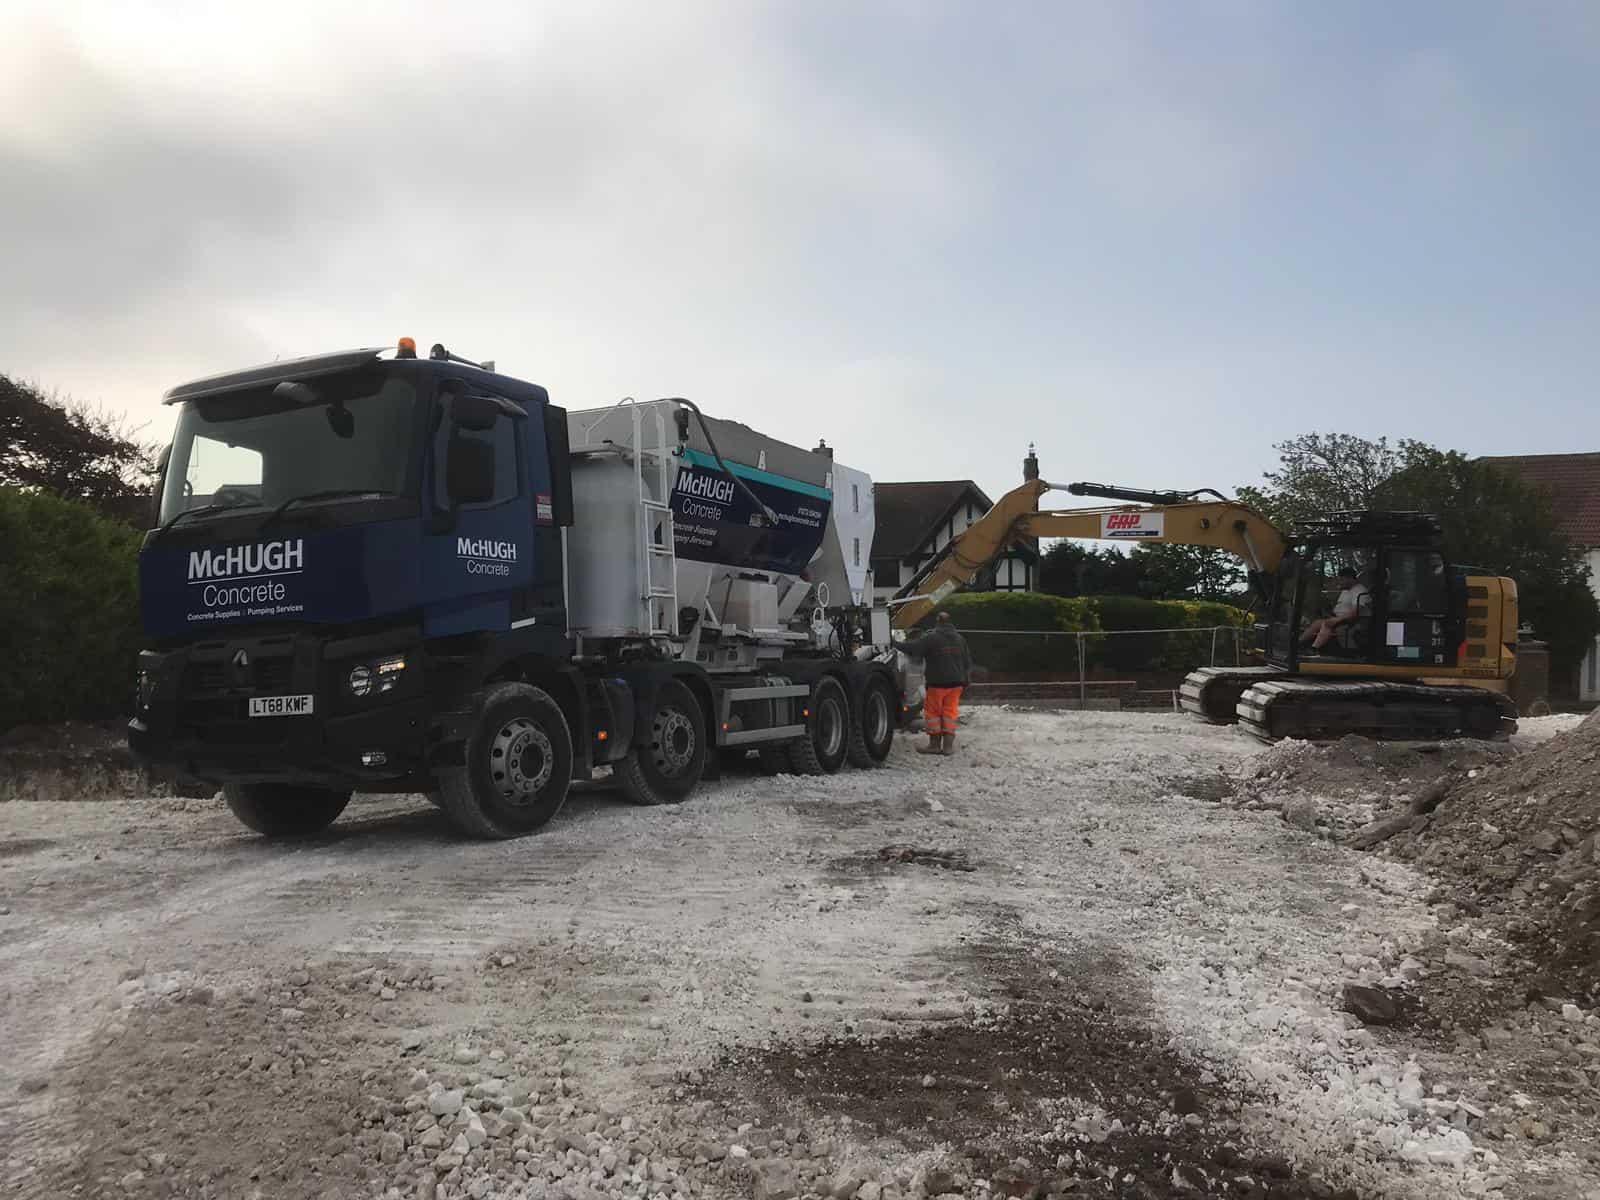 McHugh Concrete Portslade